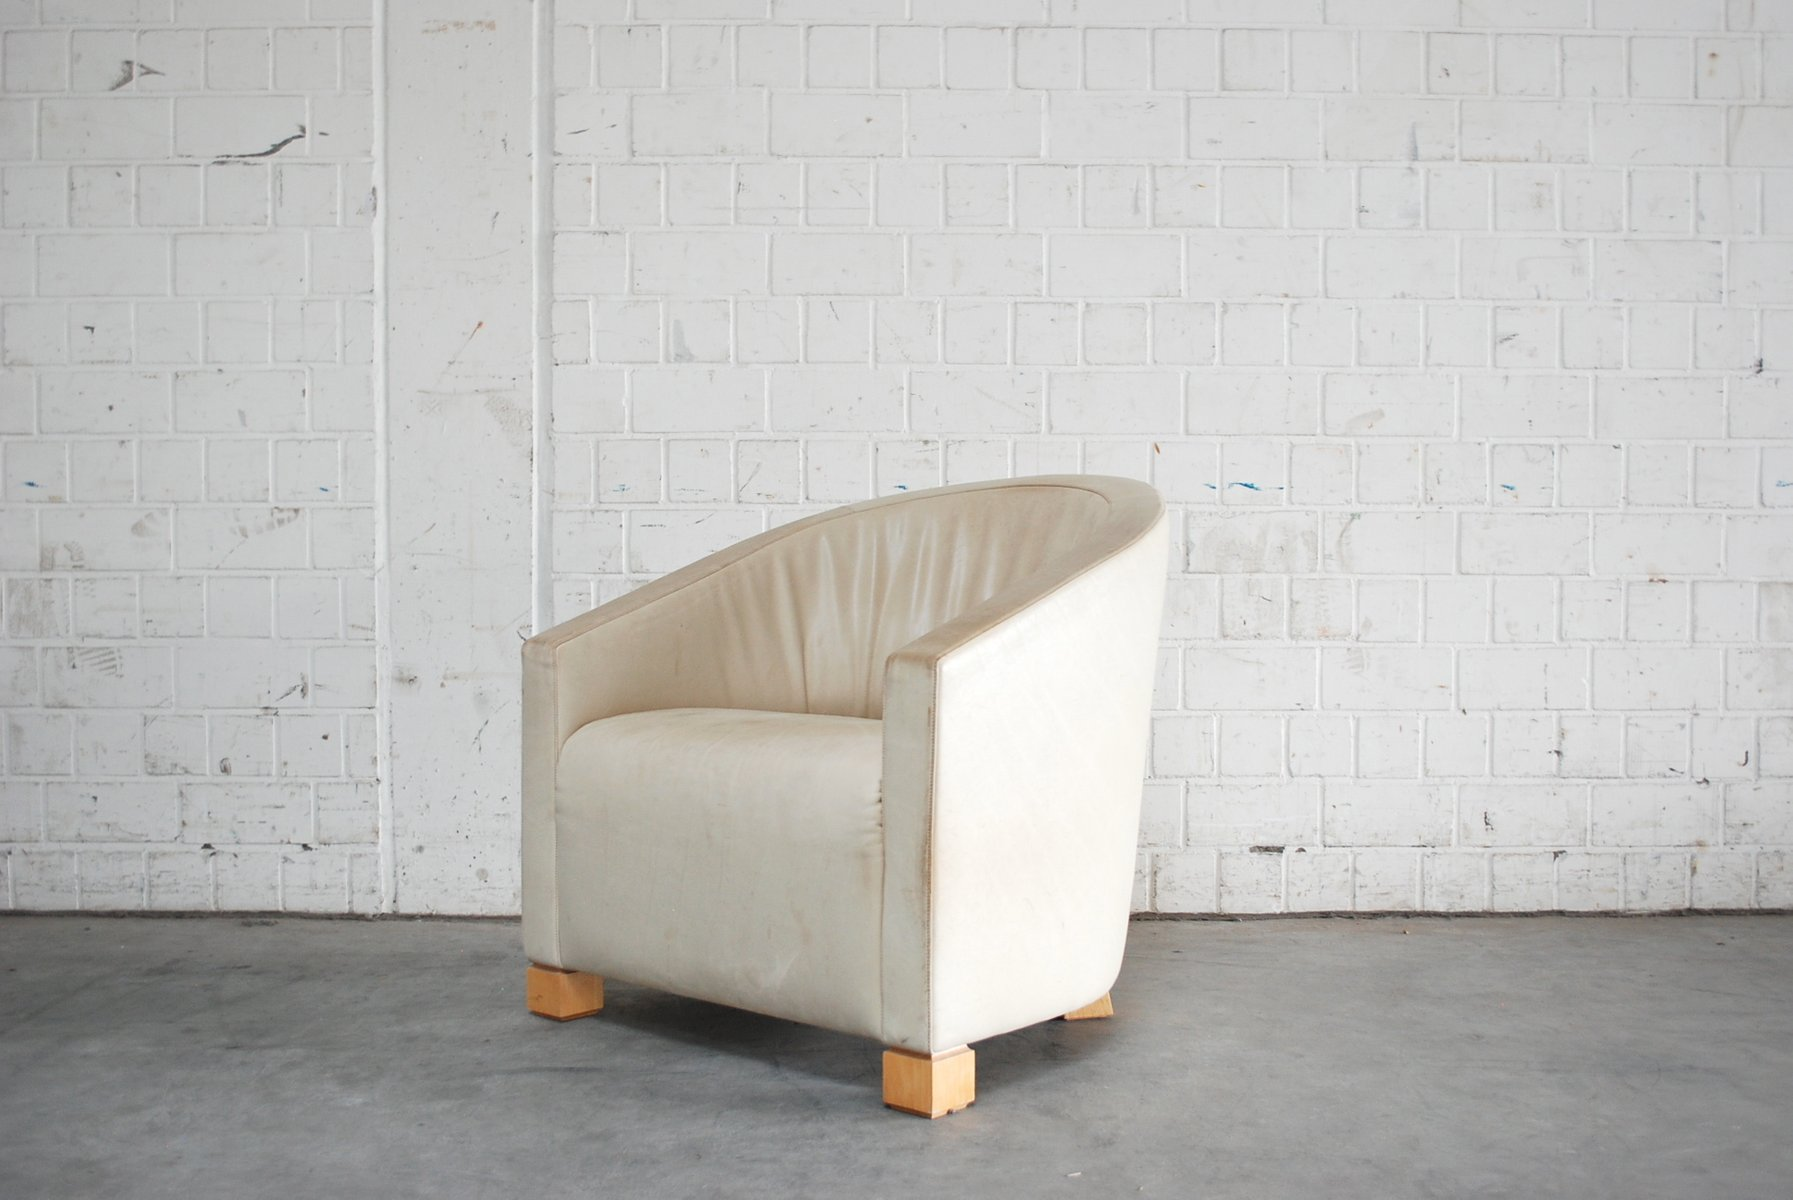 Sessel aus cremefarbenem leder von paolo piva f r de sede for Sessel aus leder